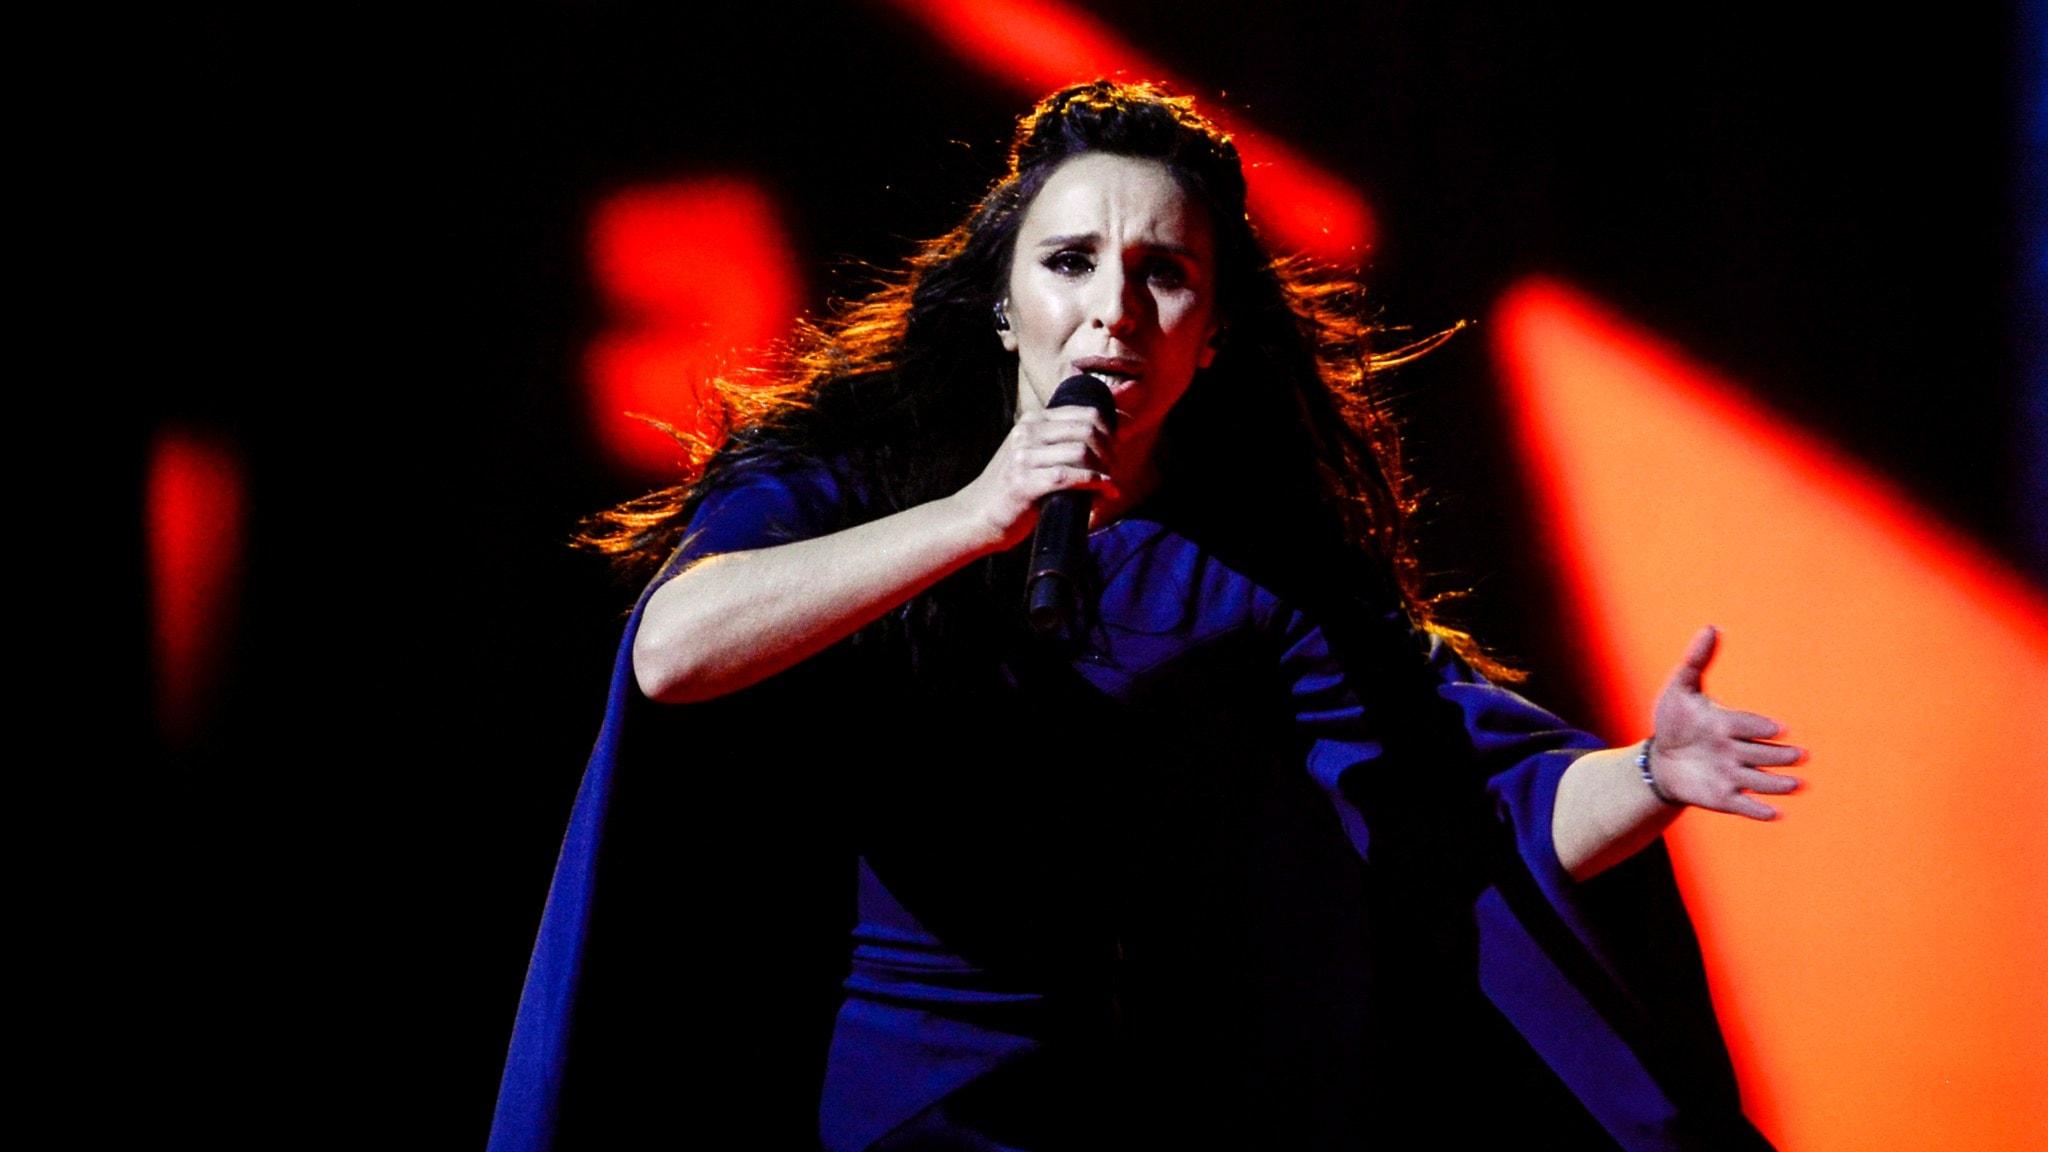 Ukraina stoppar rysk artist i Eurovision Kulturnytt i P1